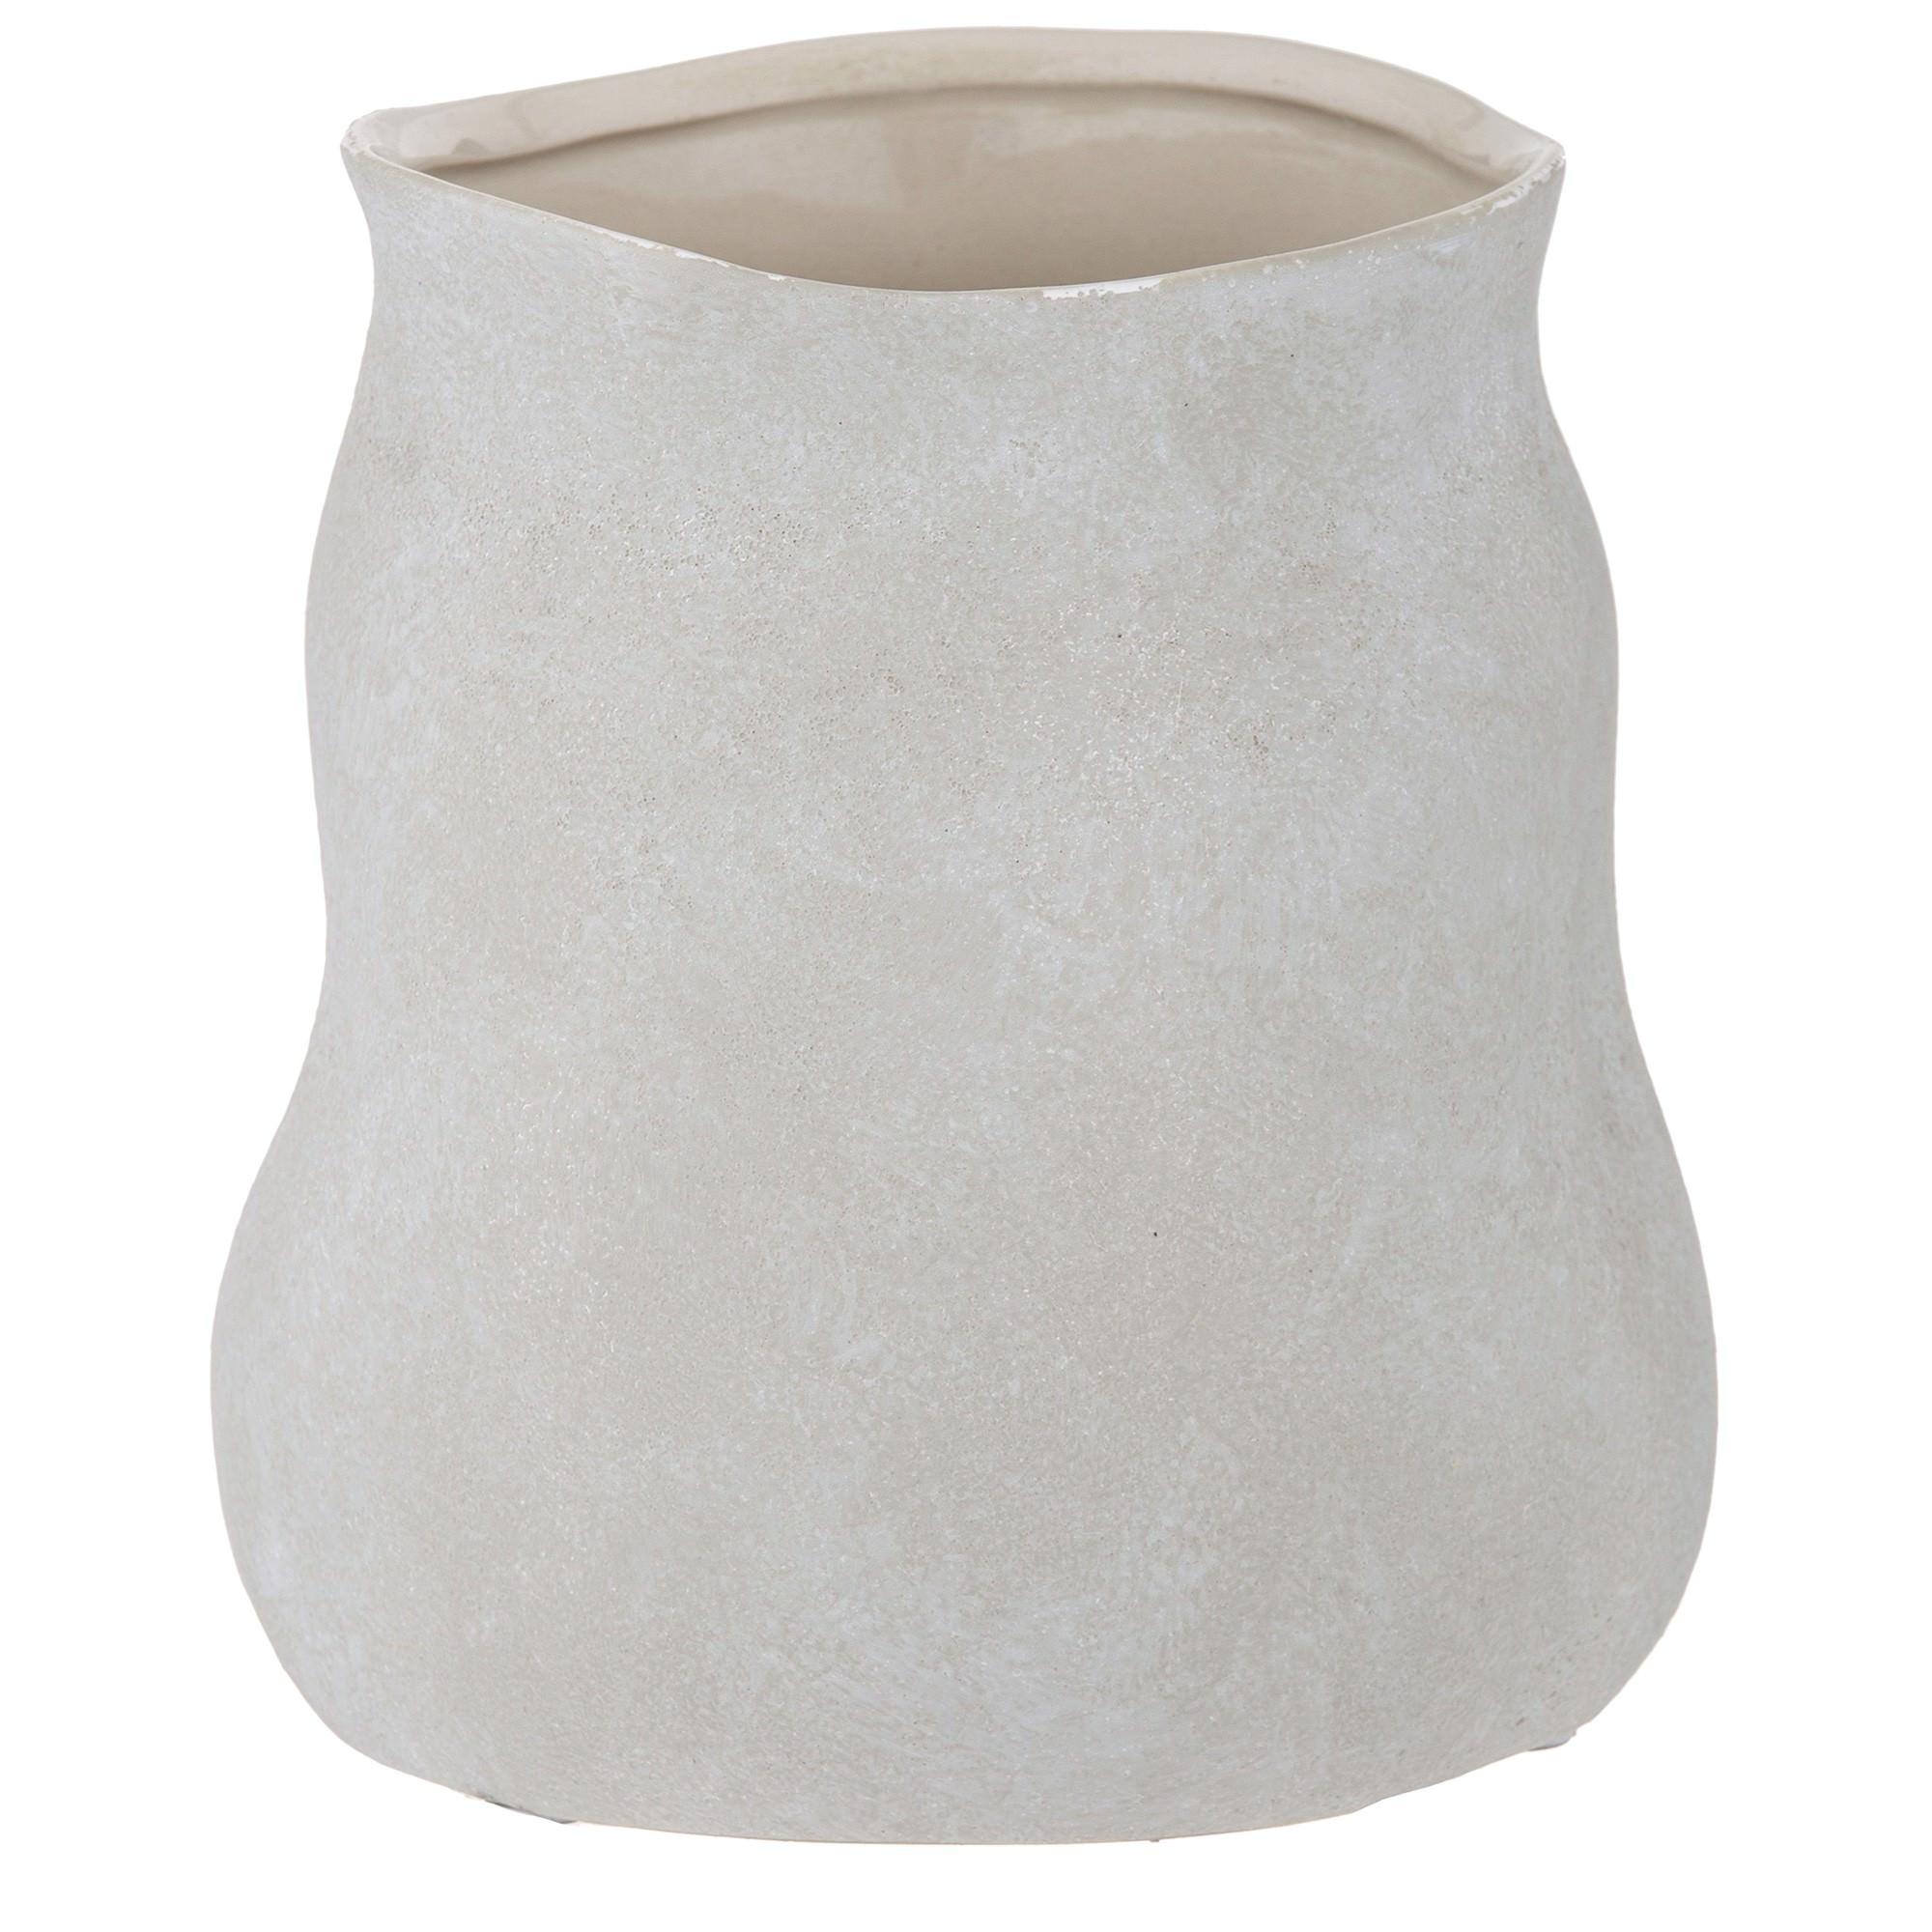 Maliah II Ceramic Pot, Large